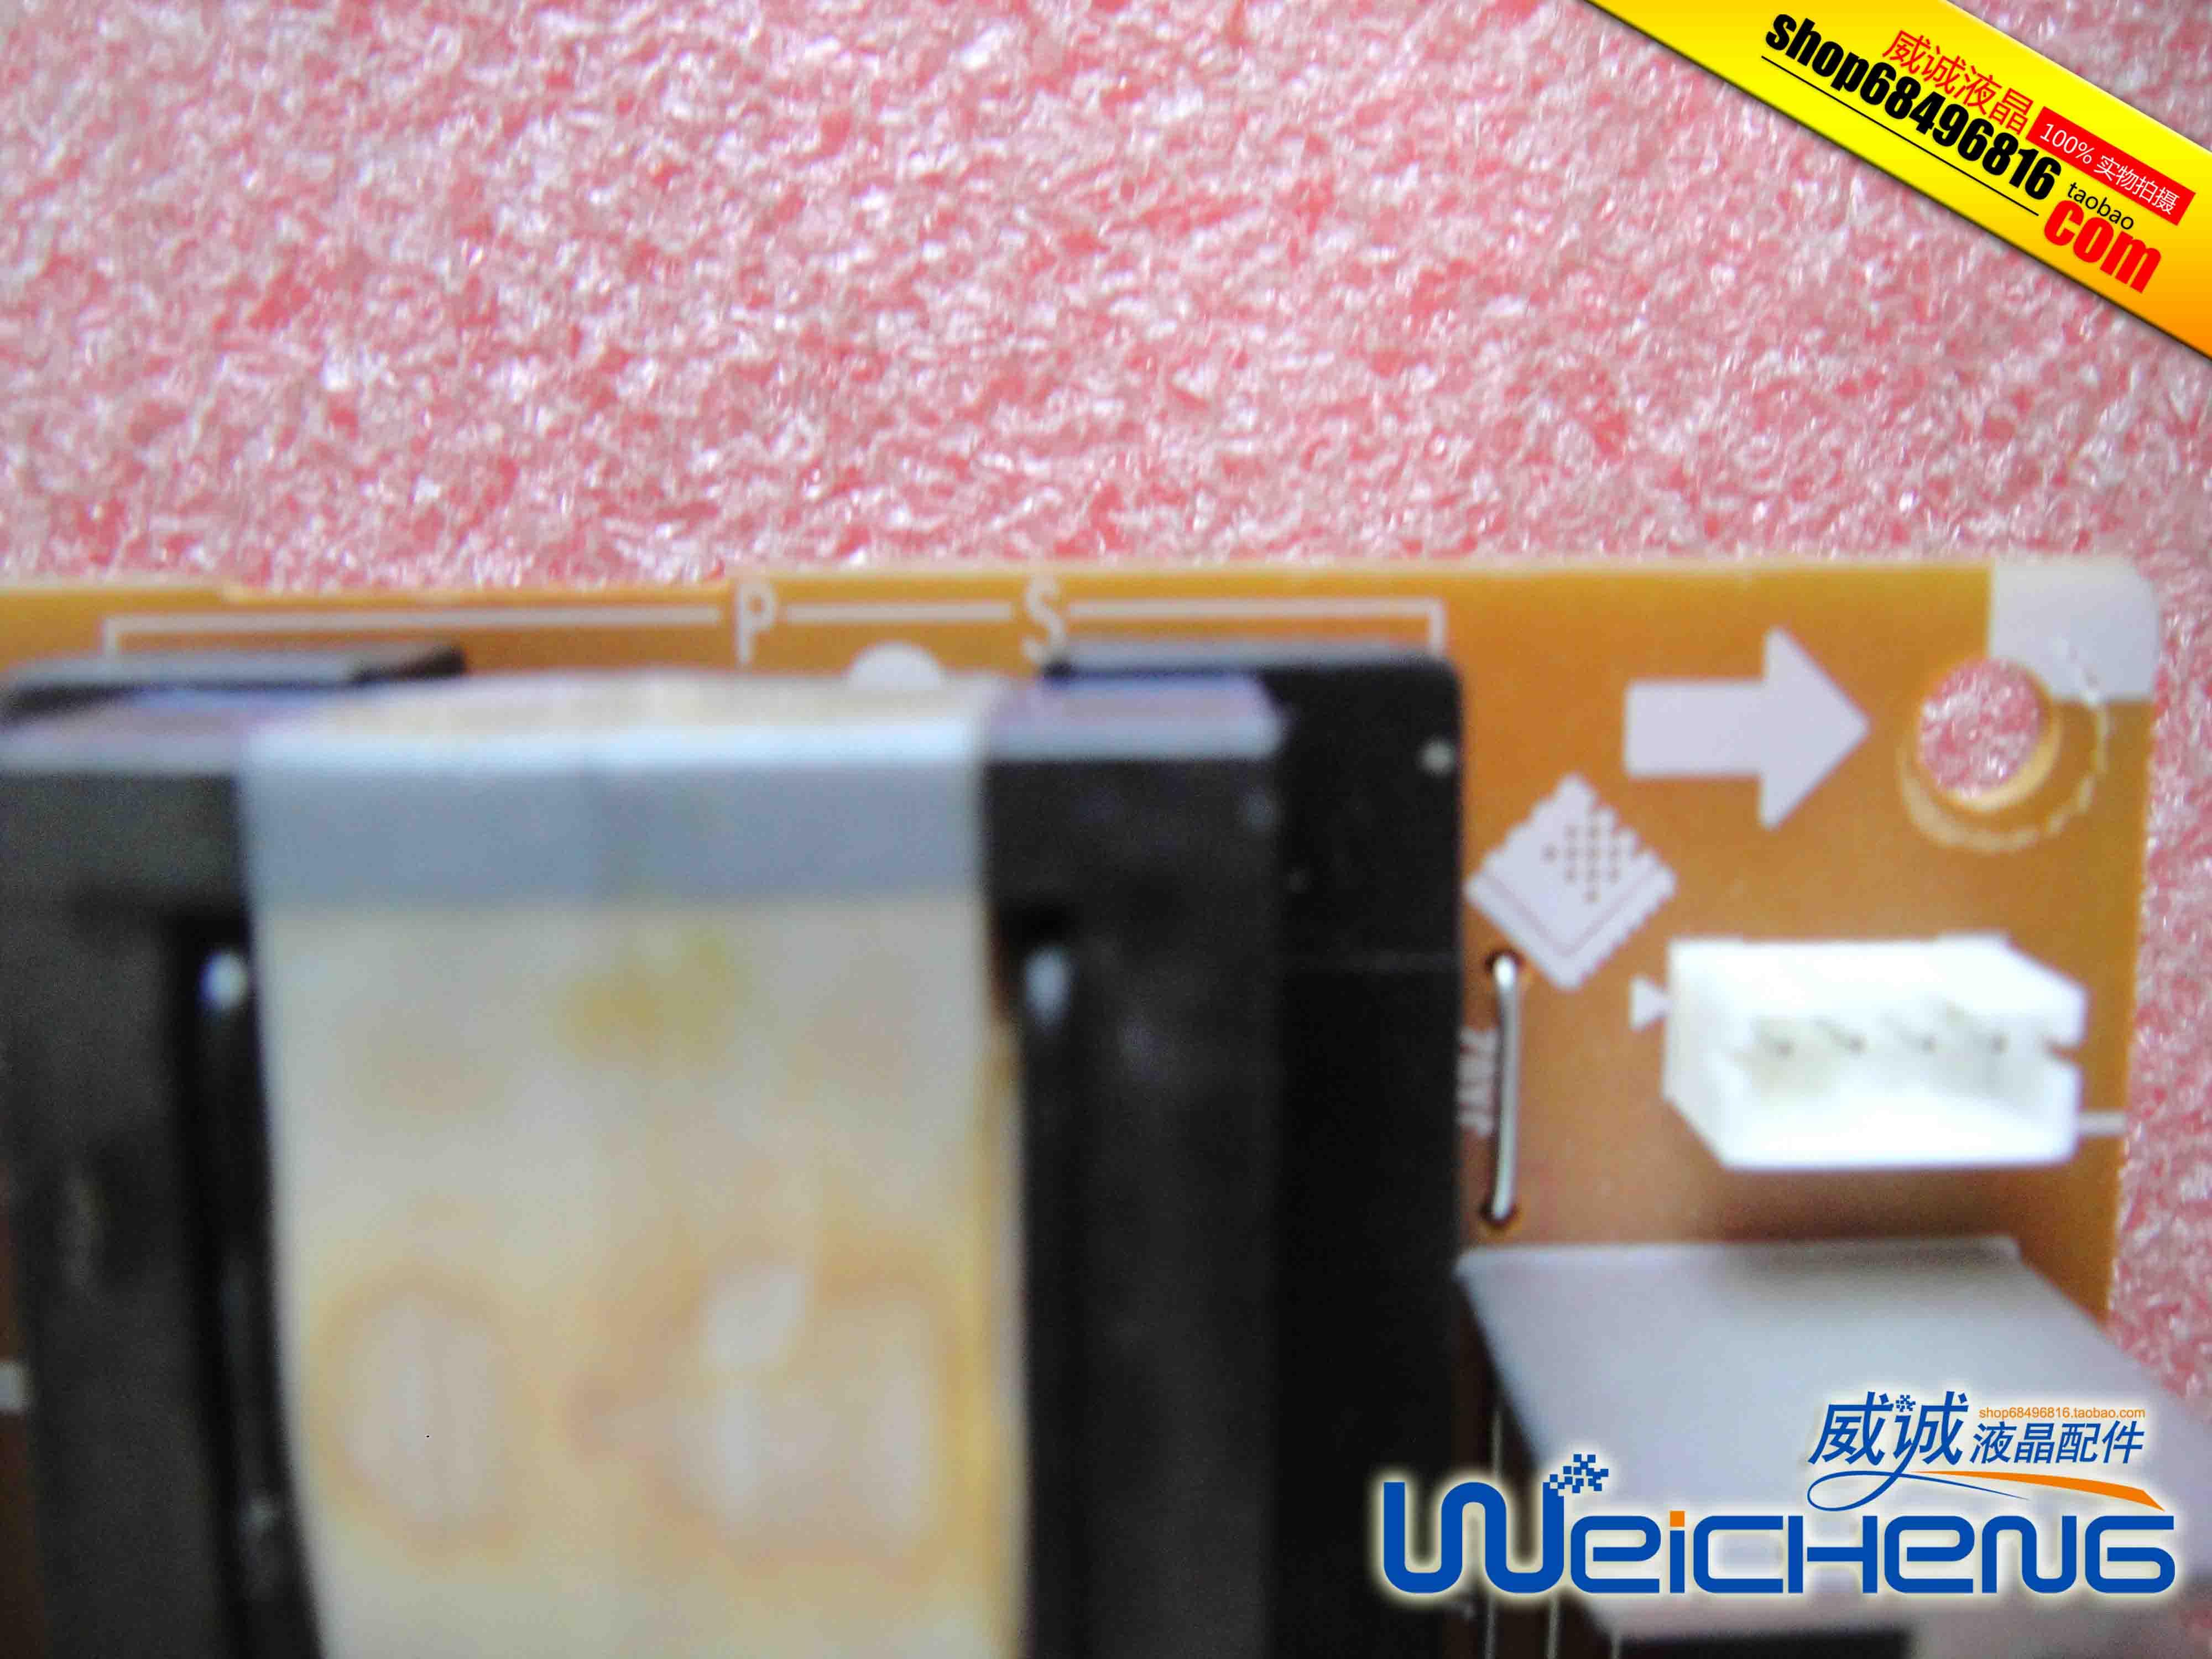 MX191 medical display power board PCB-POWER 05A25724C1